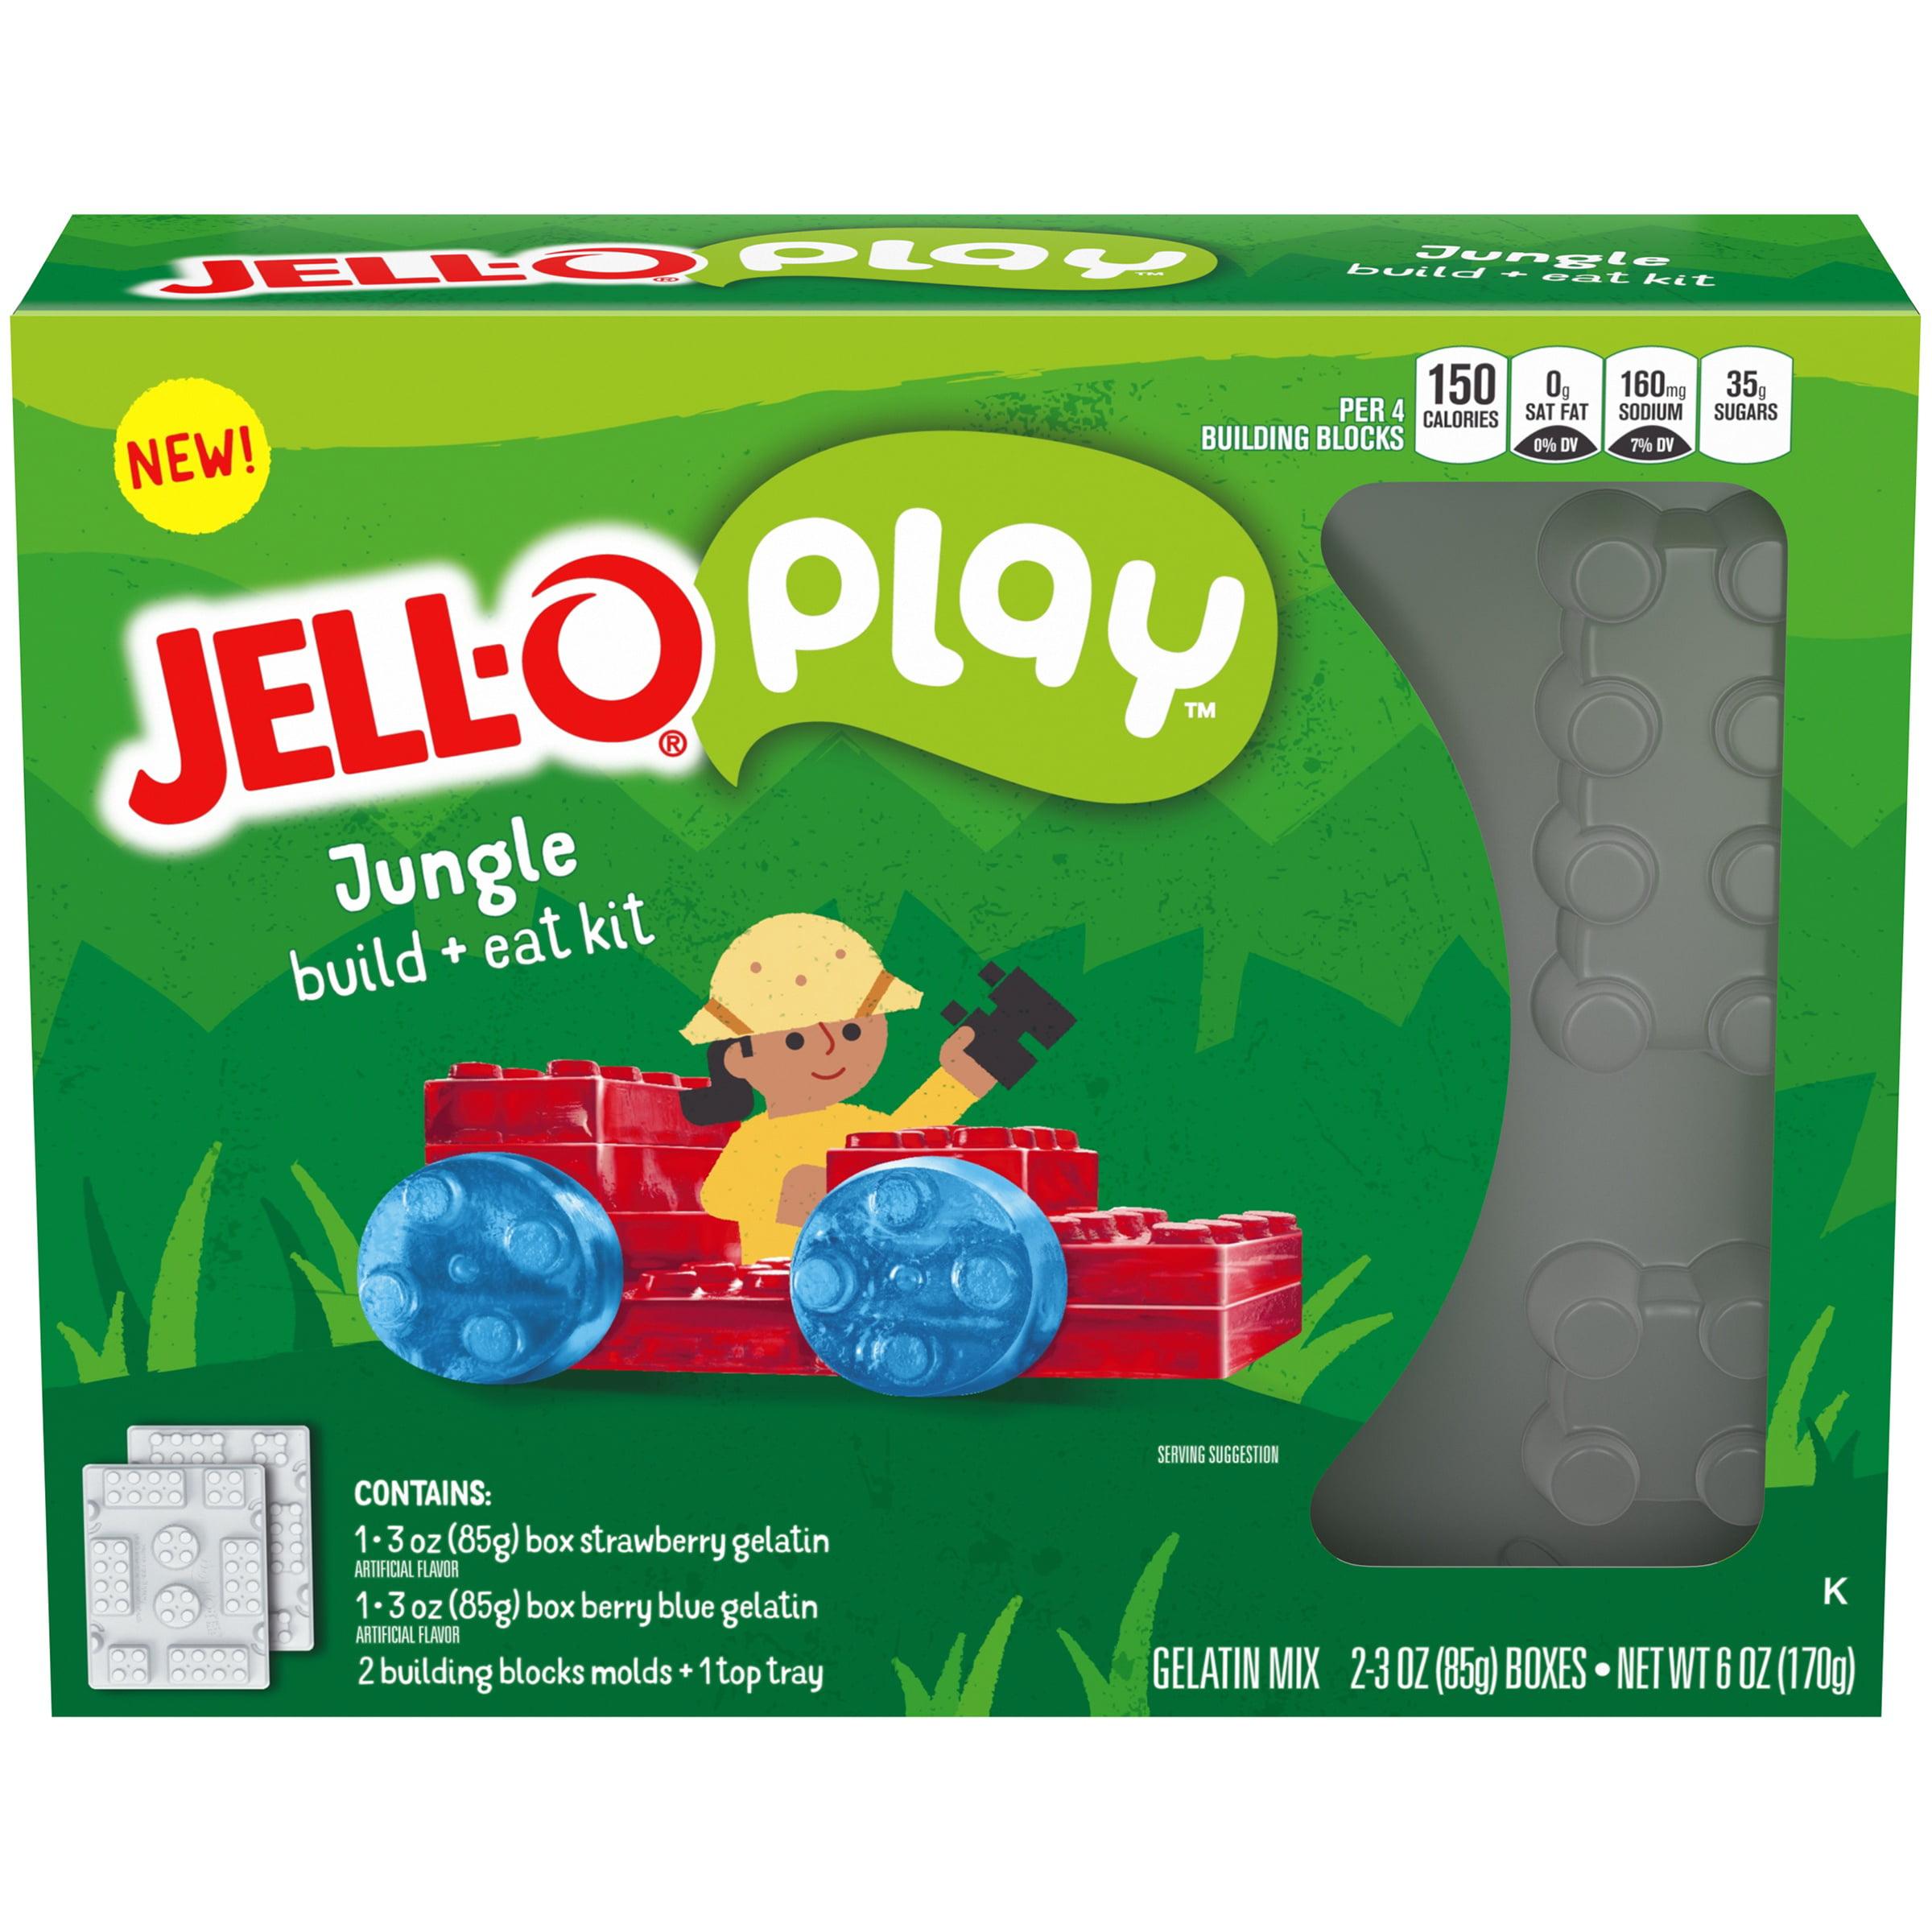 Jell-O Play Jungle Build + Eat Gelatin Kit 5 pc Box